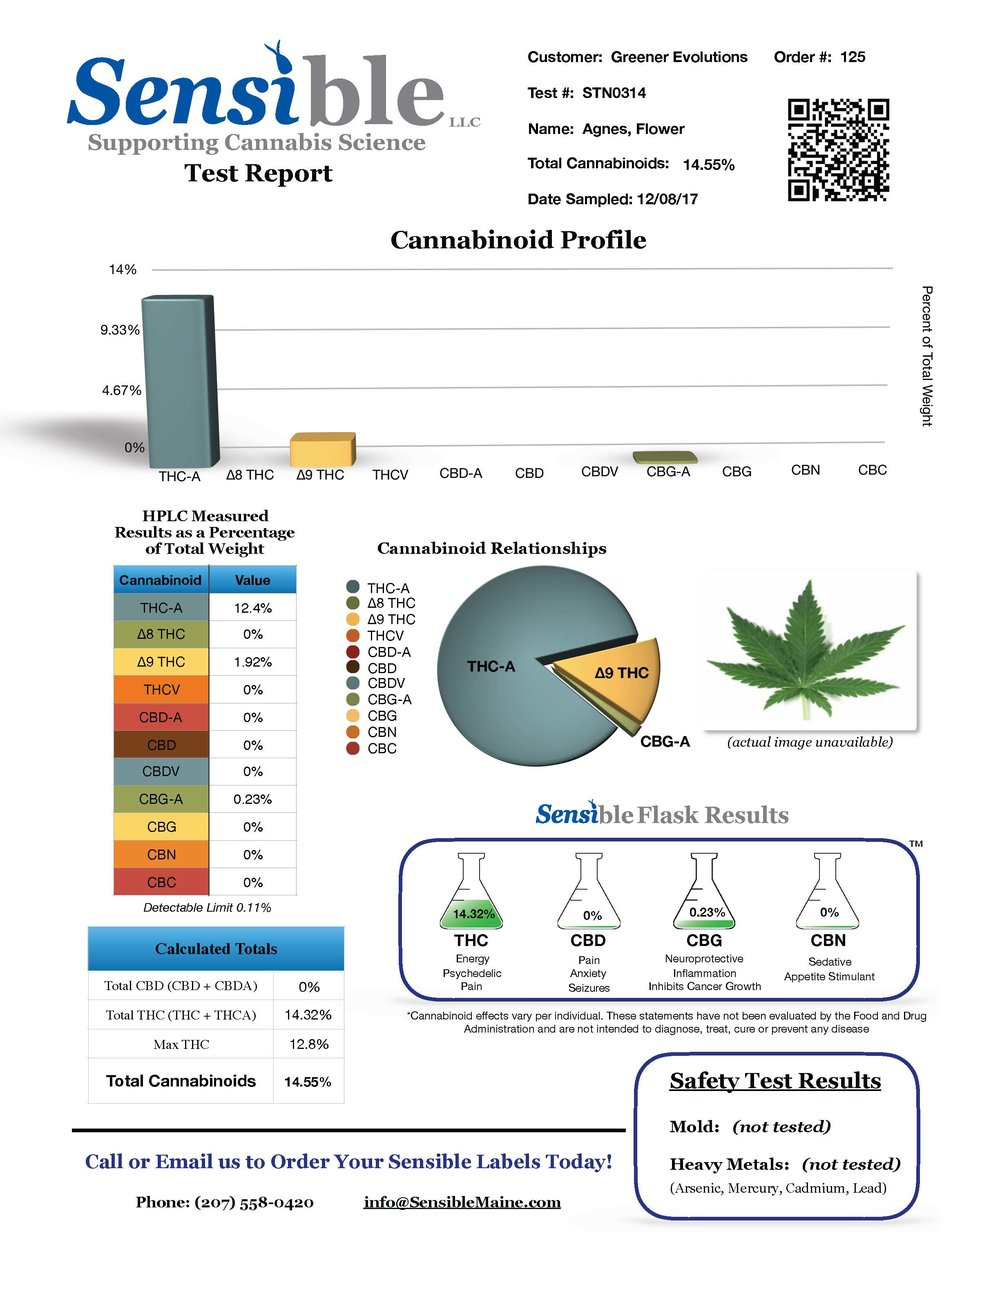 Test Report stn0314.jpg